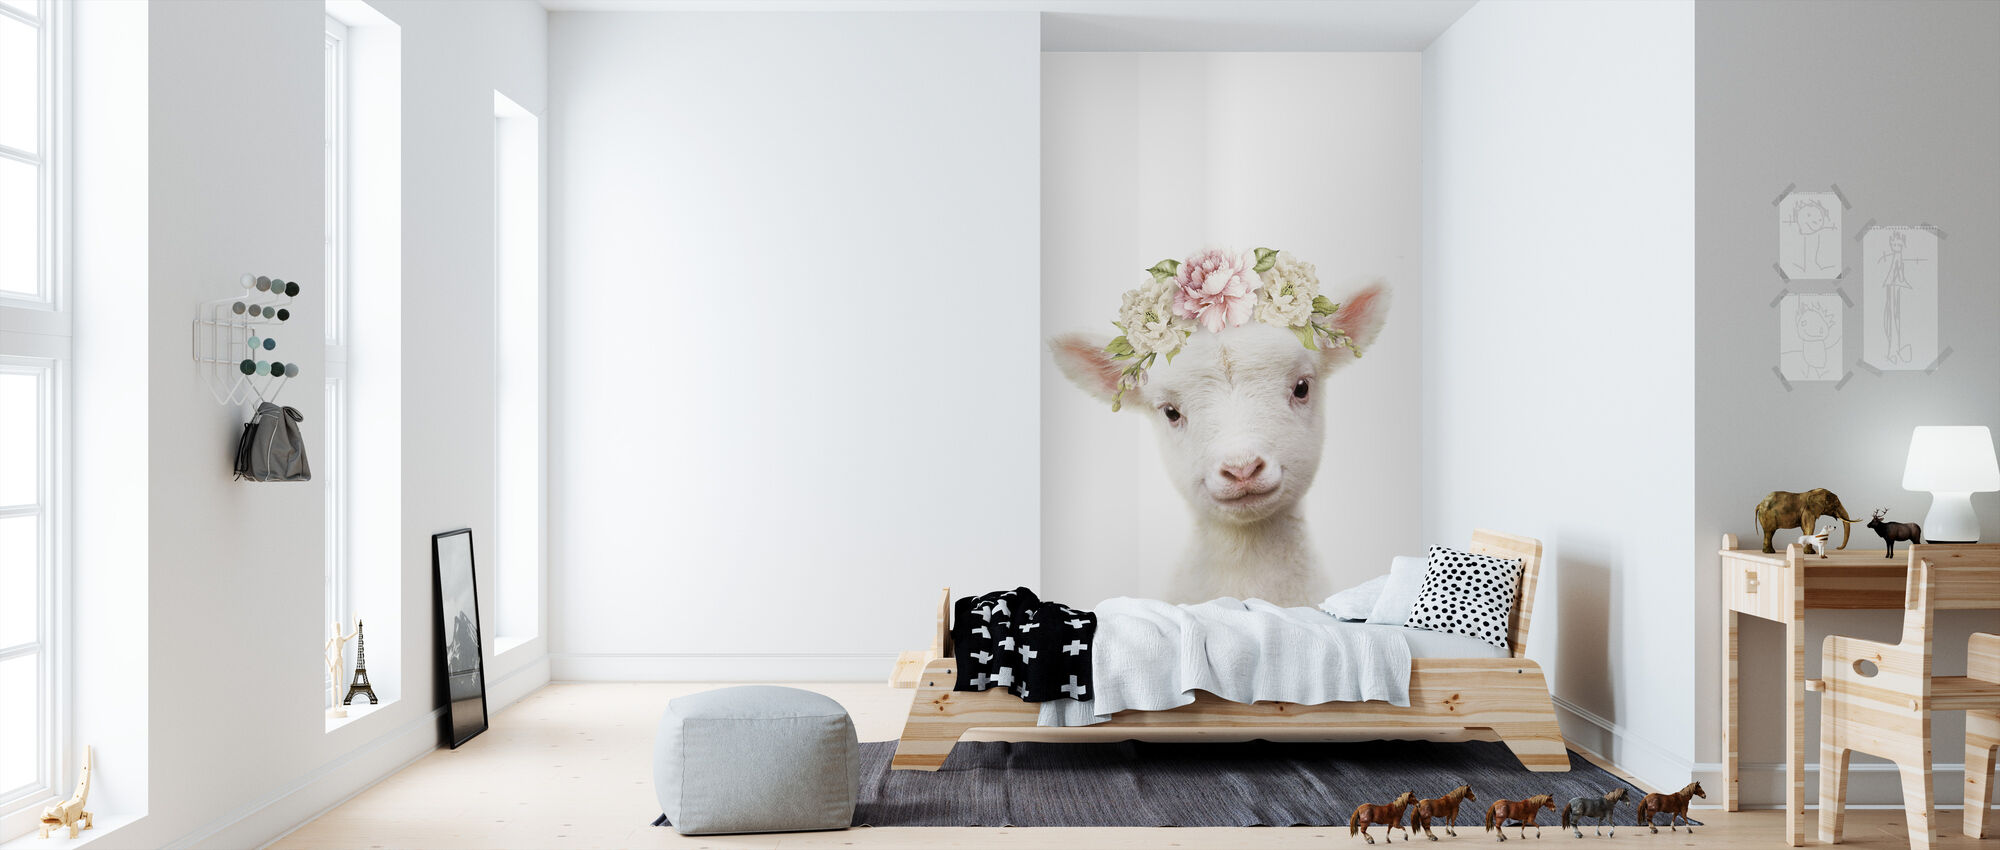 Floral Lamb - Wallpaper - Kids Room